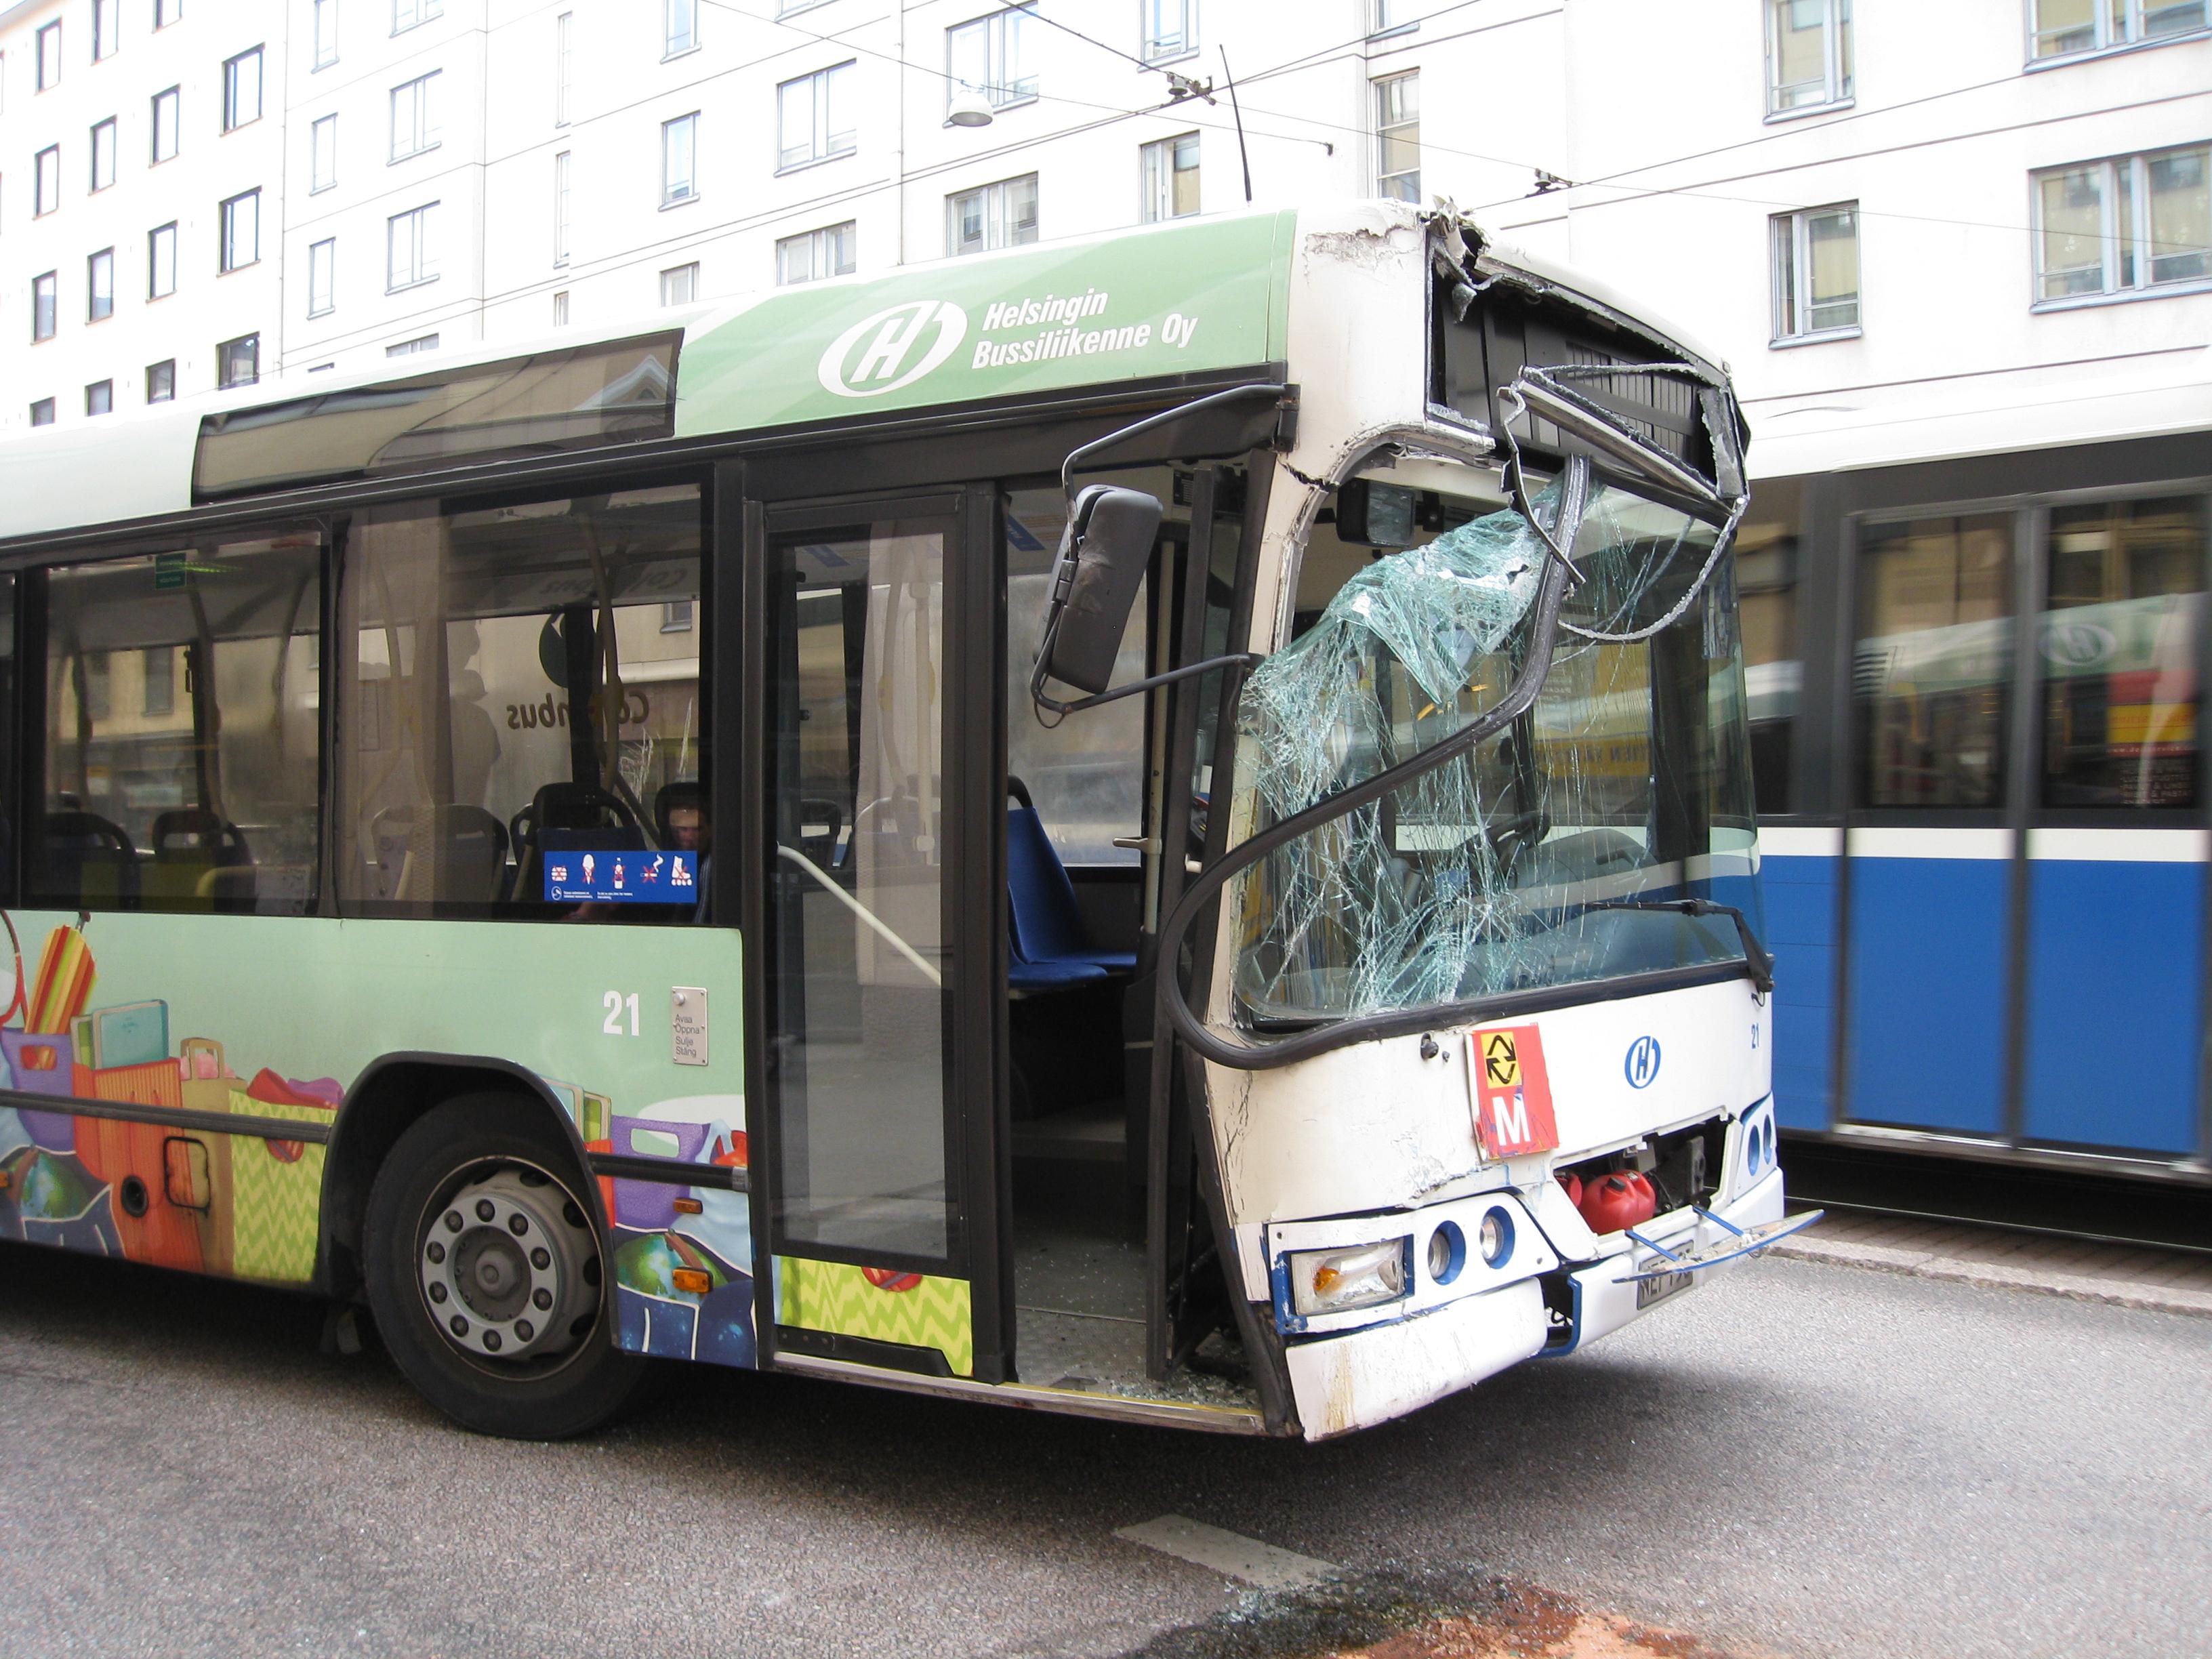 File:Crashed bus Helsinki.jpg - Wikimedia Commons